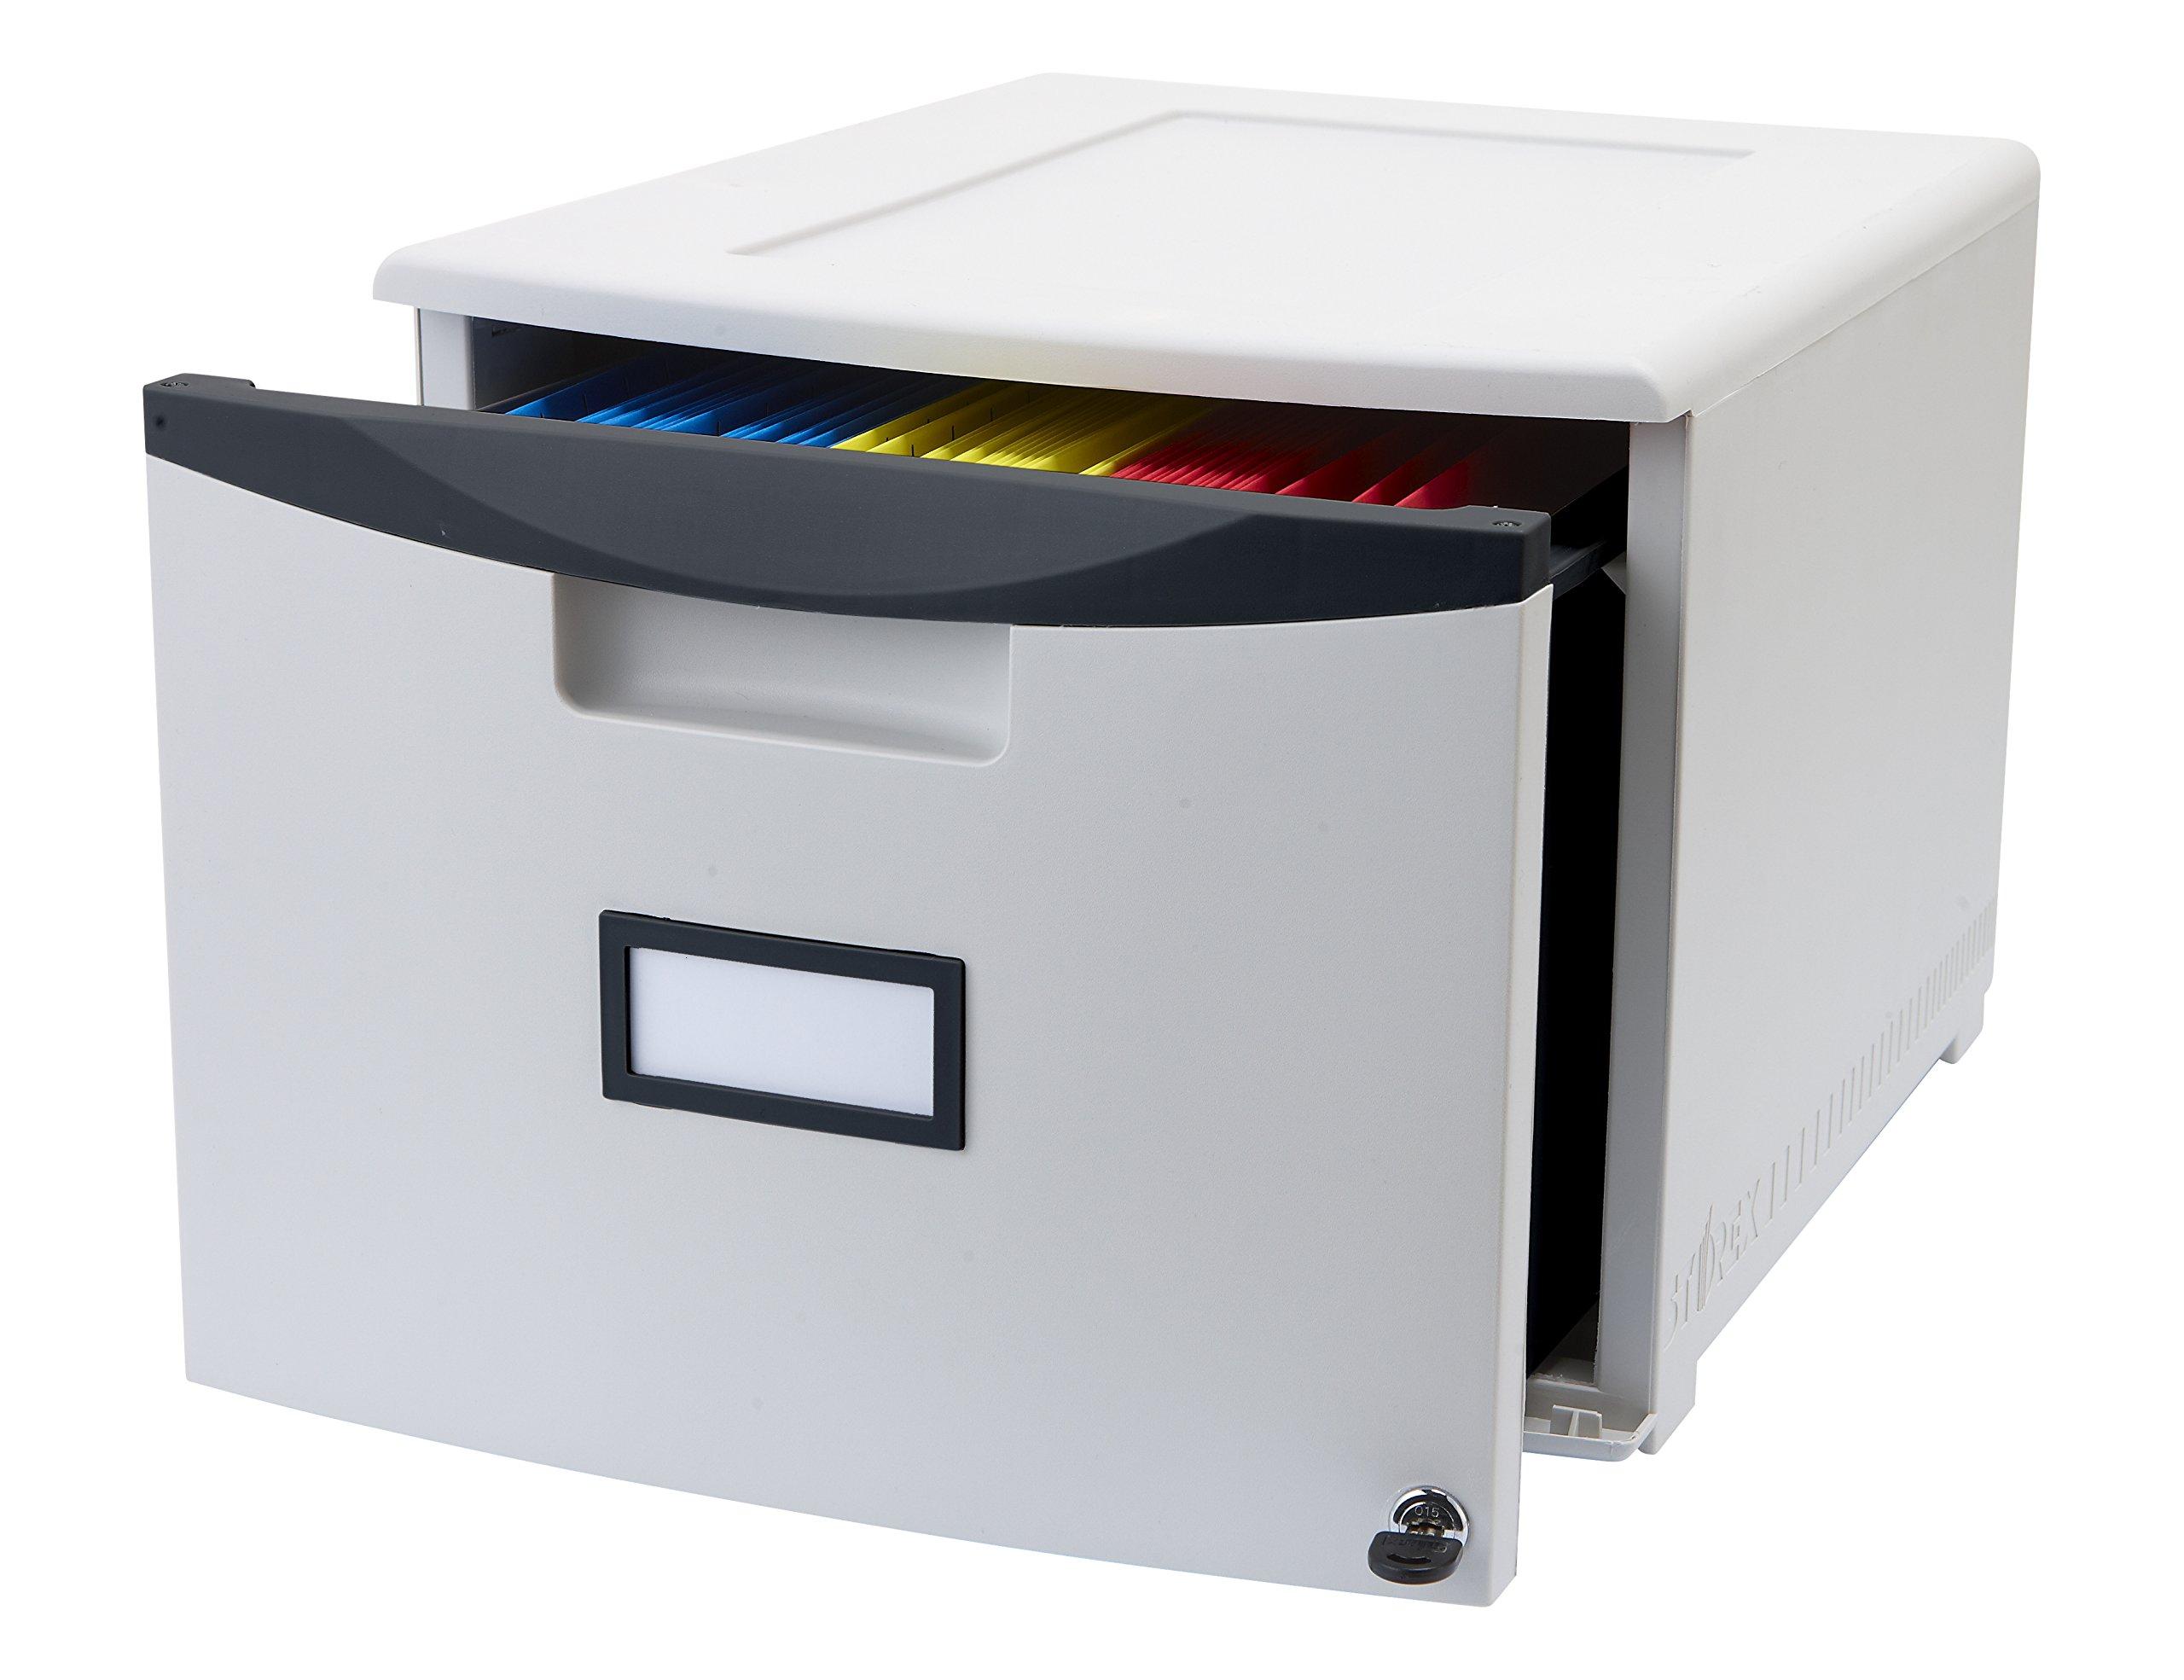 Storex 61267B01C Plastic 1-Drawer Portable File Cabinet, Letter/Legal, Gray/Black